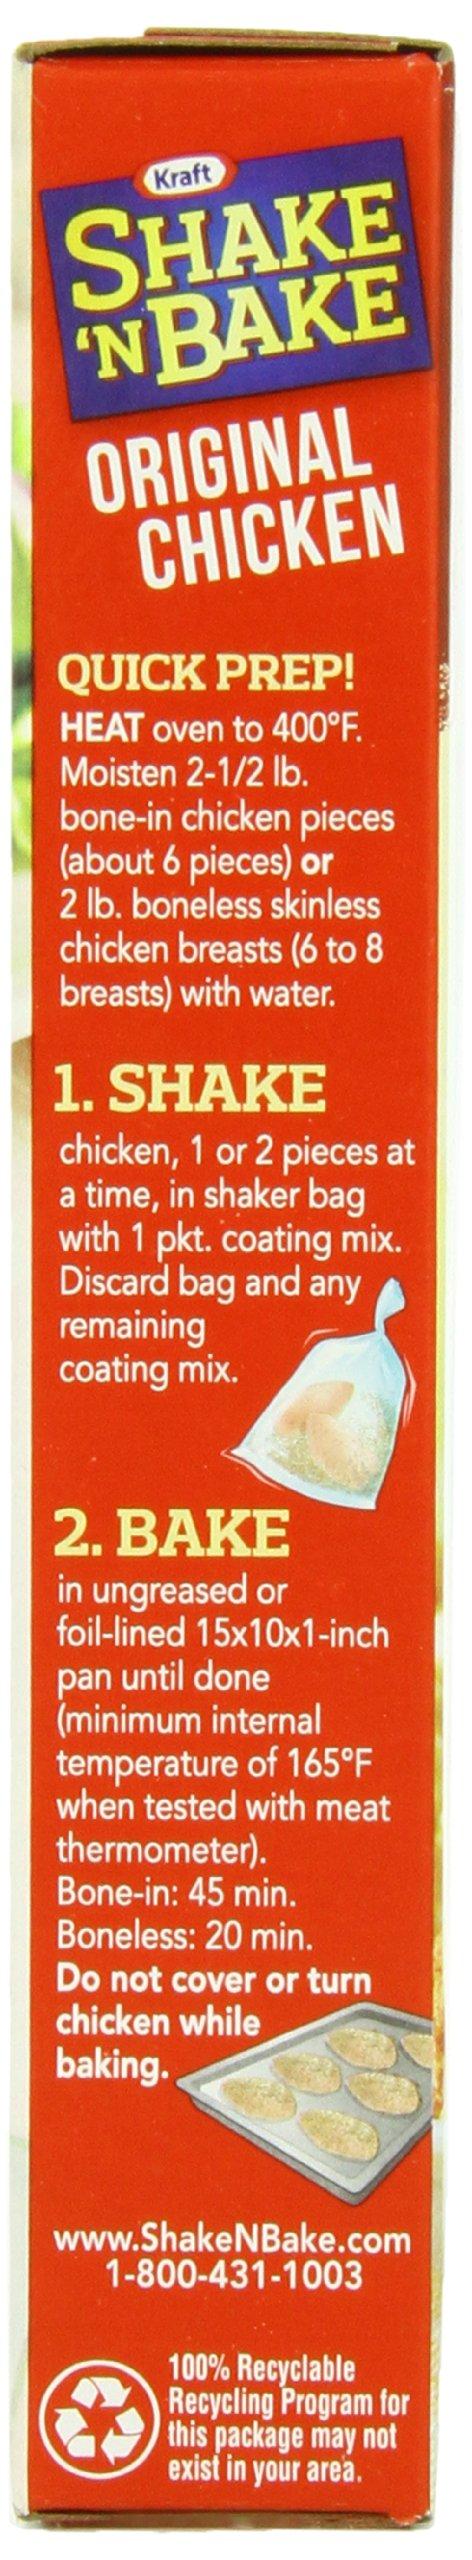 Kraft Shake N Bake Seasoned Coating Mix Box, Original Chicken, 4.5 Ounce (Pack of 12) by Kraft (Image #6)